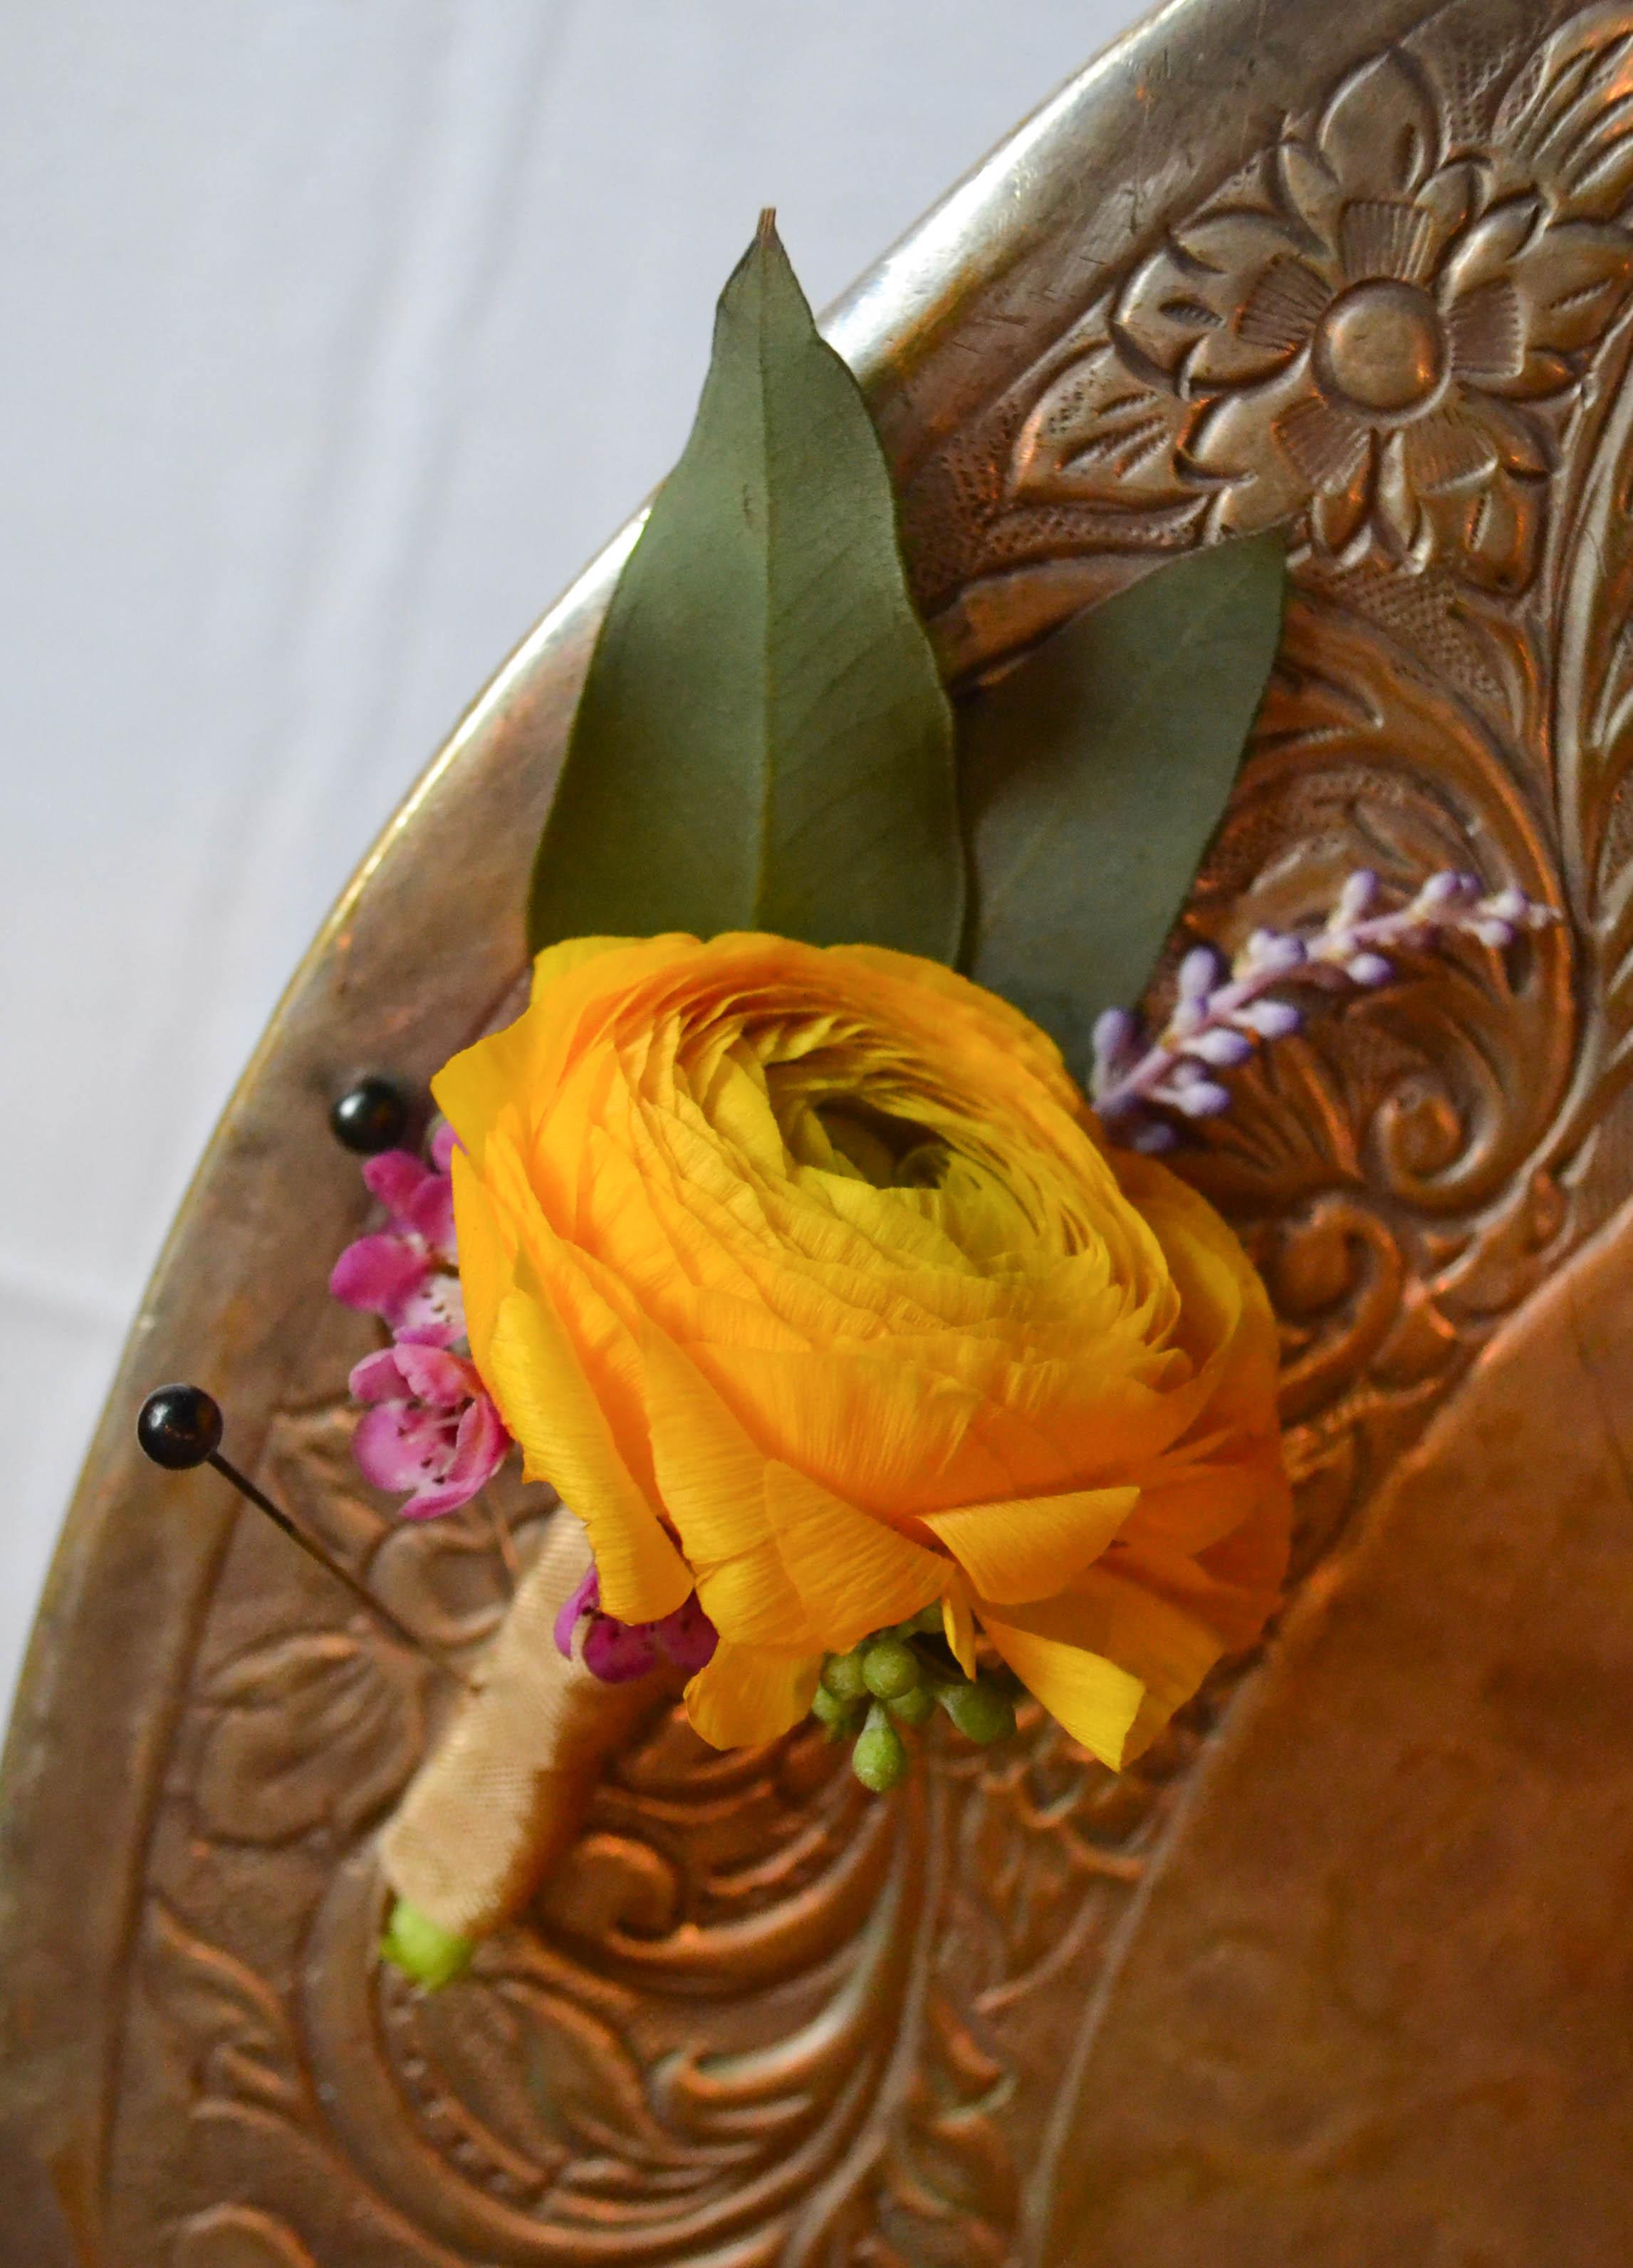 Yellow groom's boutoniere